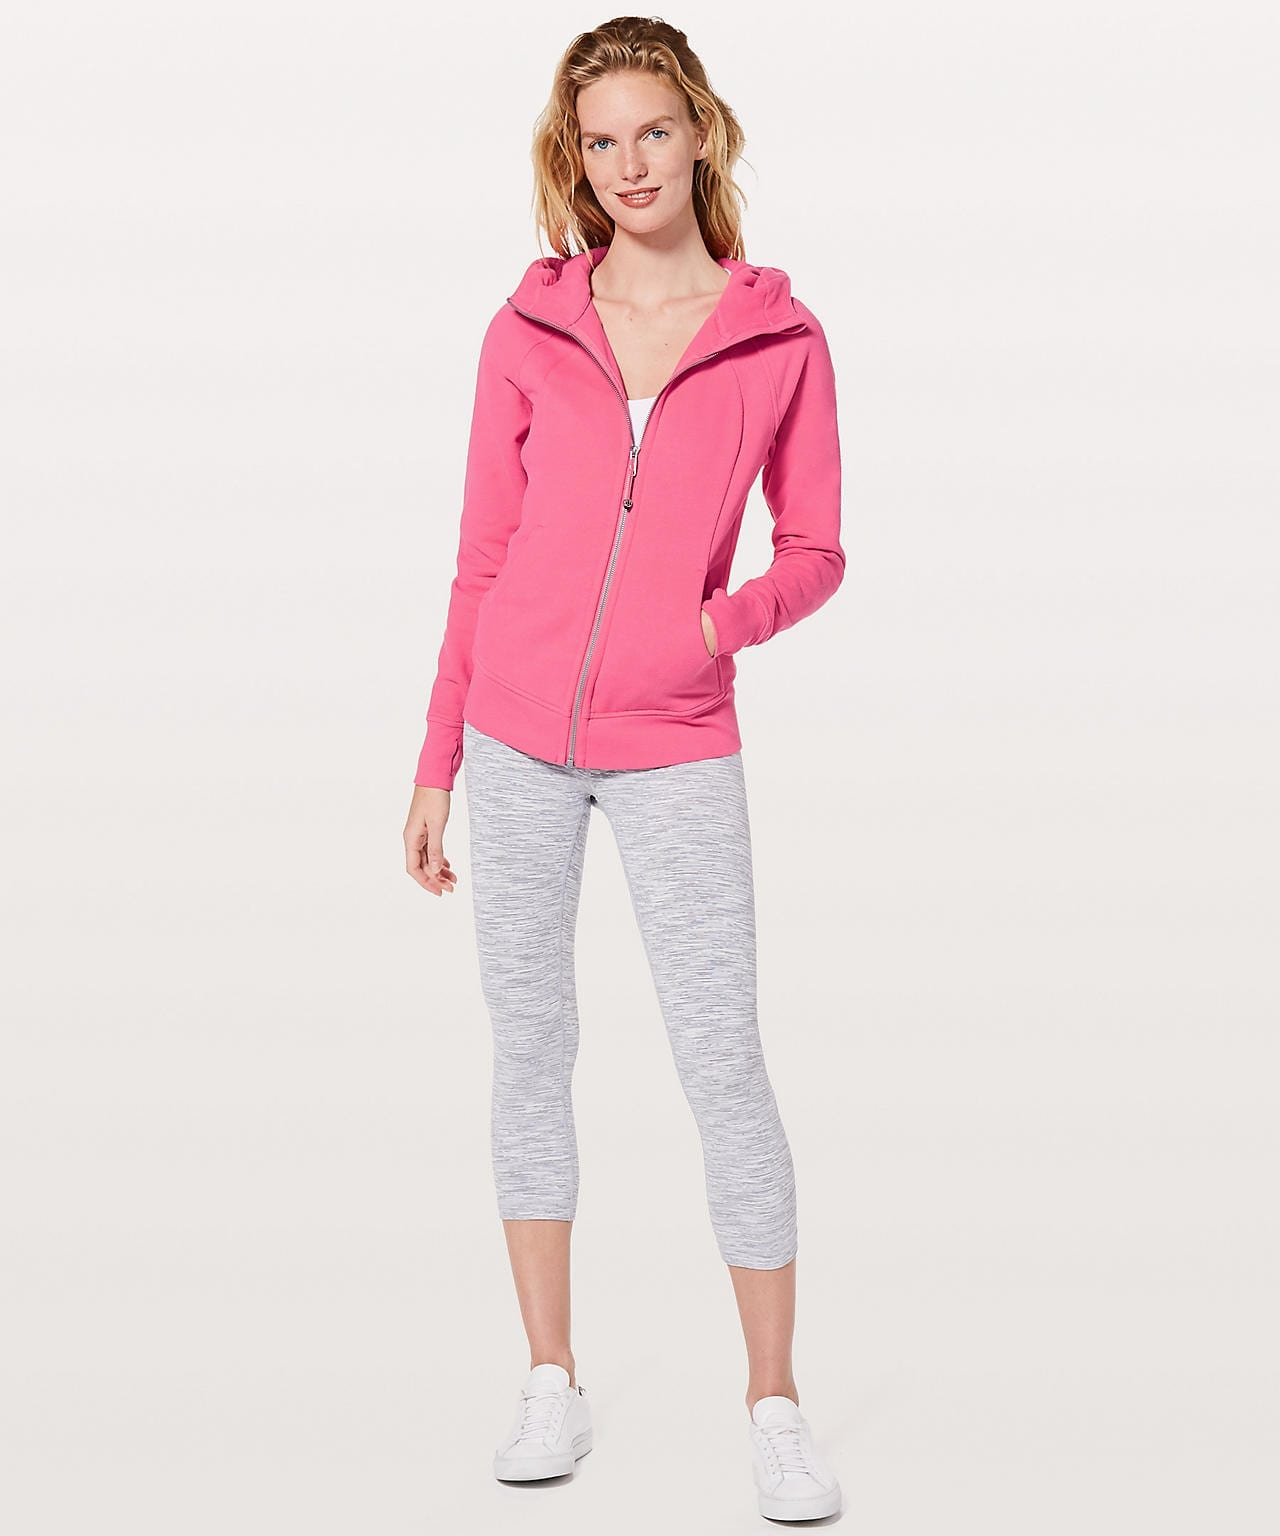 Lululemon Scuba Hoodie Light - Glossy Pink